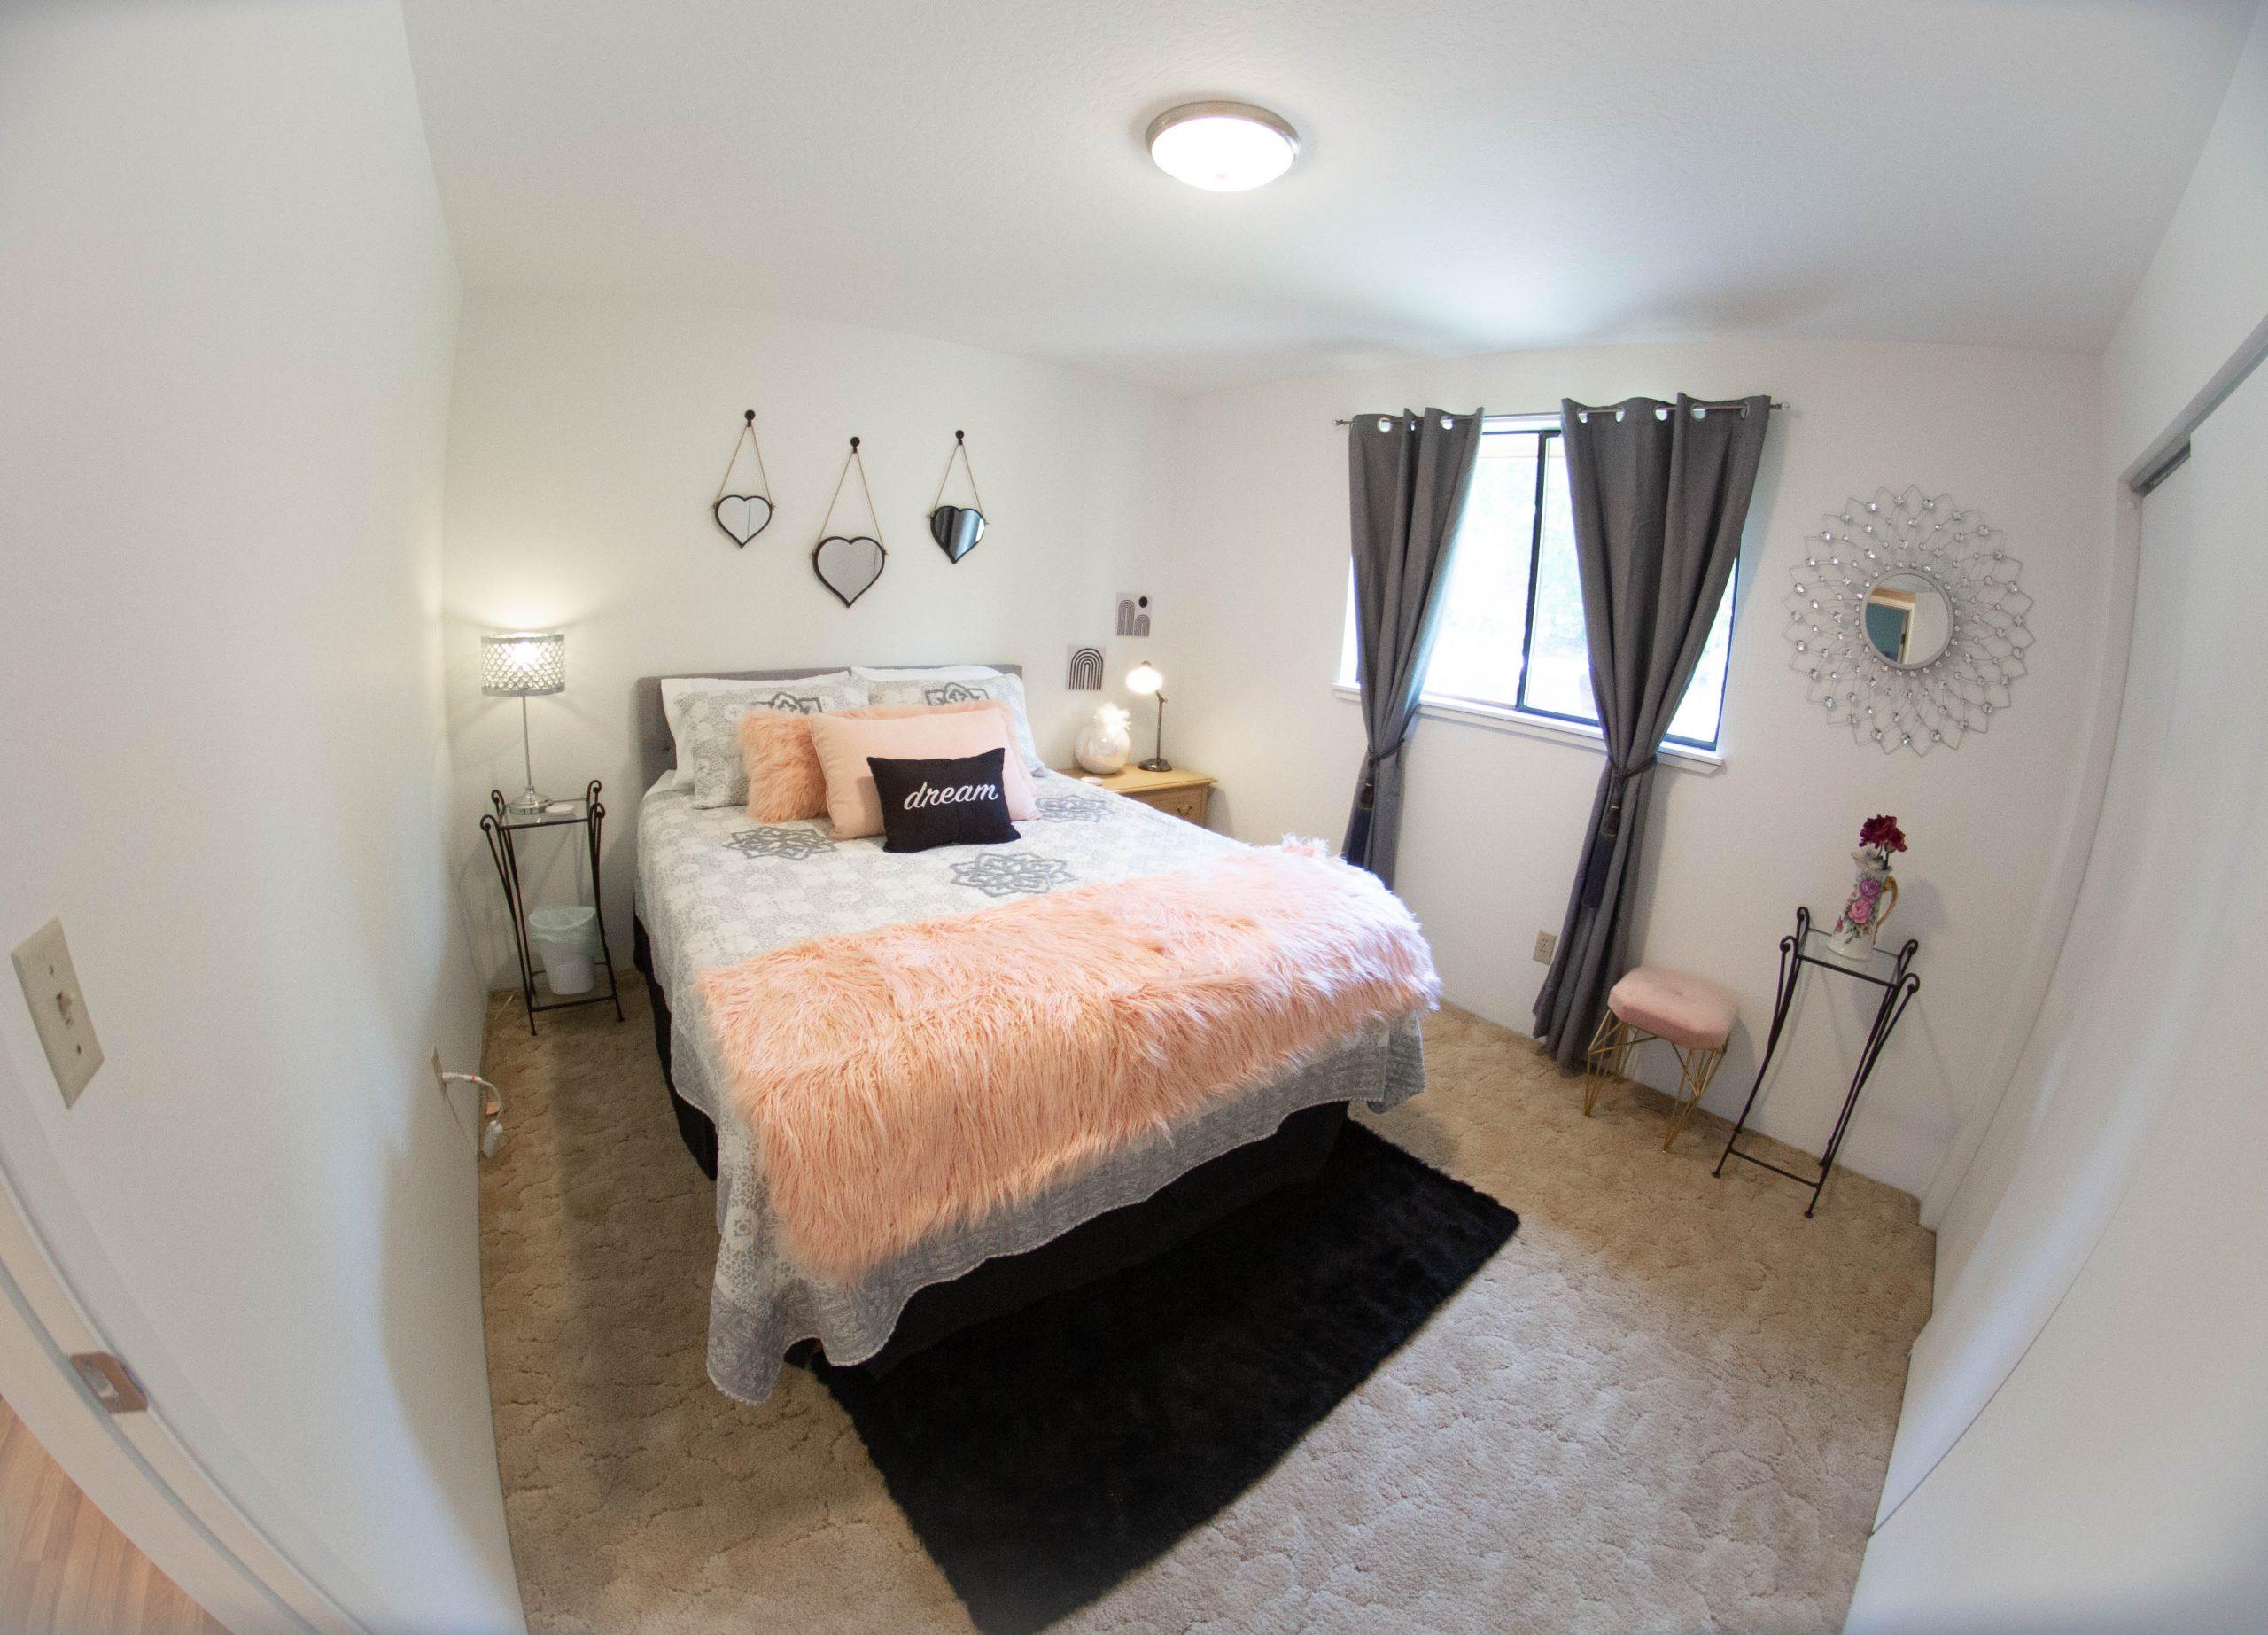 Queen-Bed-Room-Angels-Landing-Port-Angeles-Washington-Vacation-Home